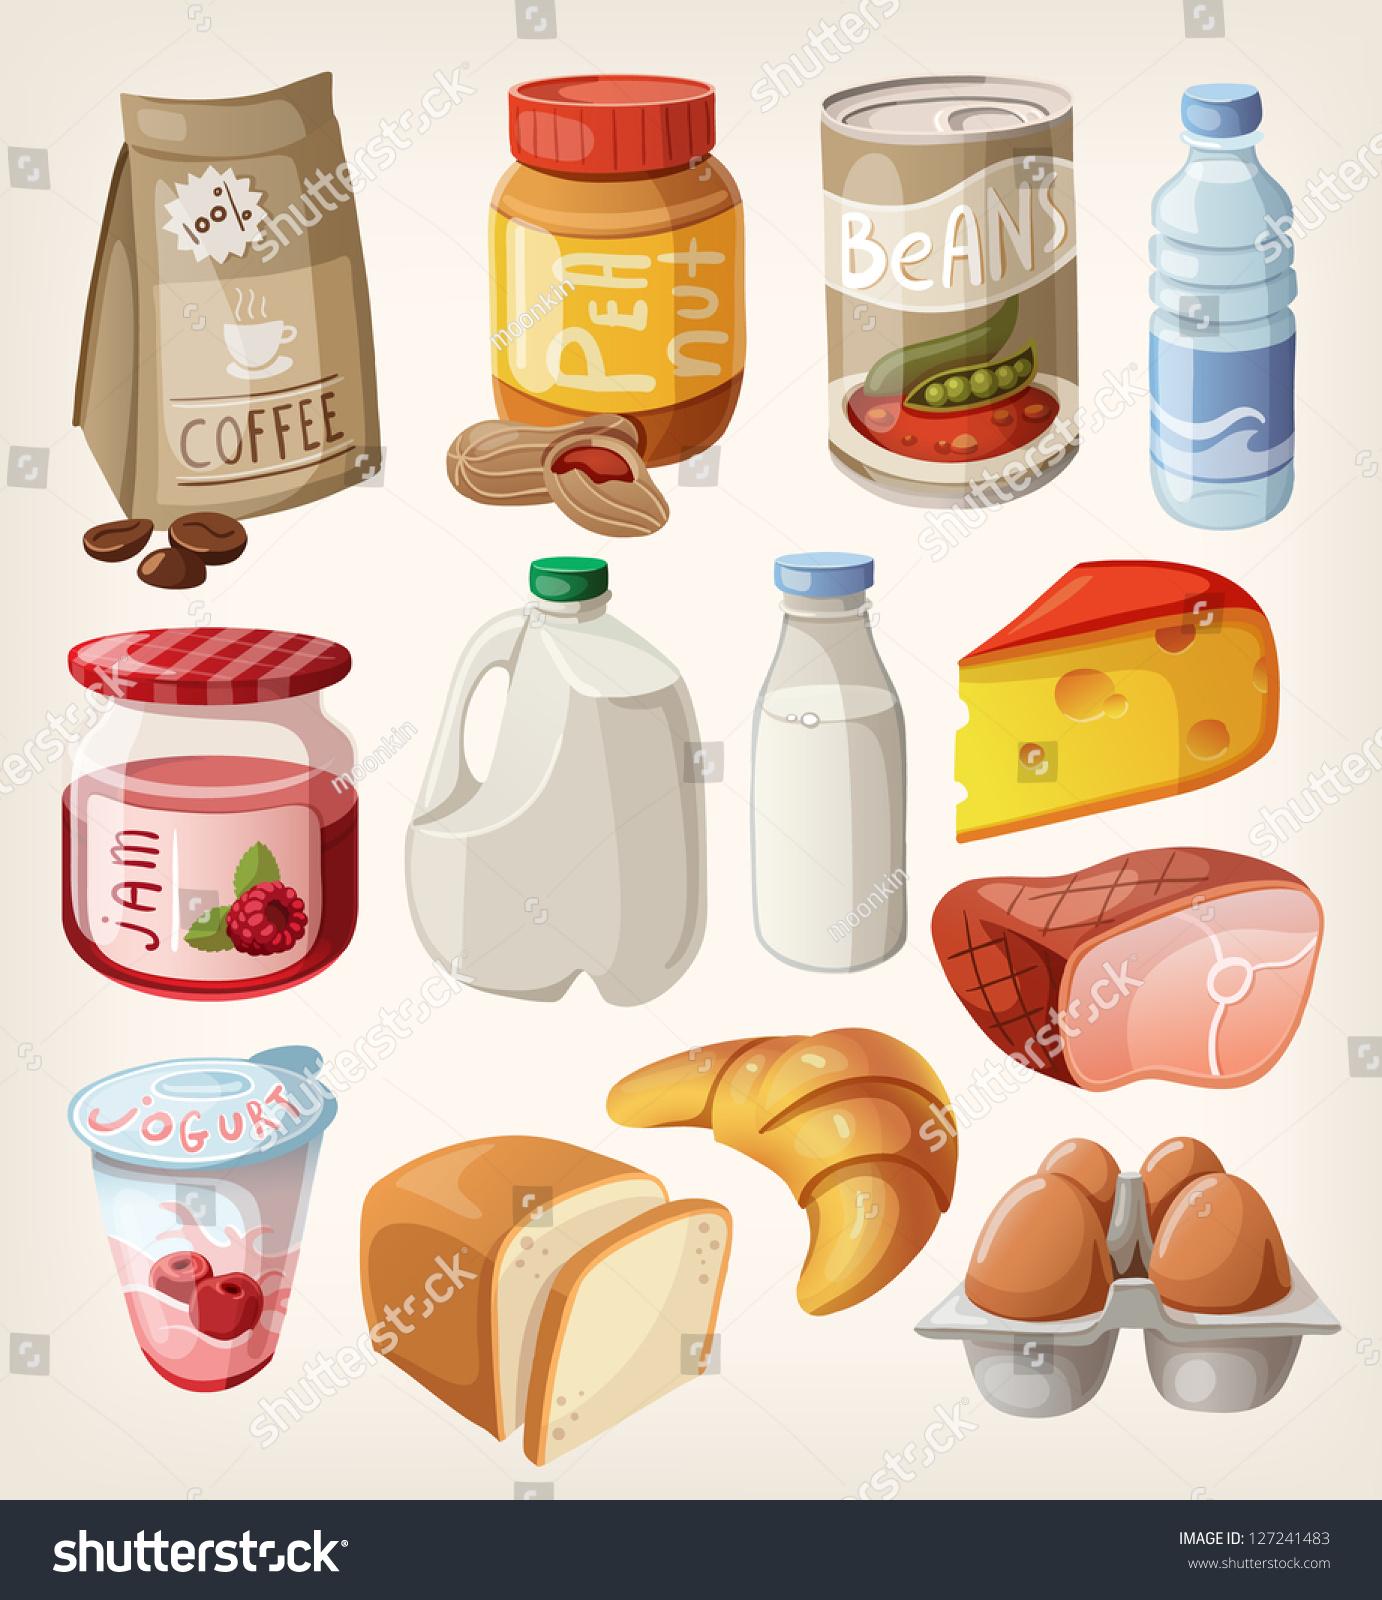 Where Buy Food Online